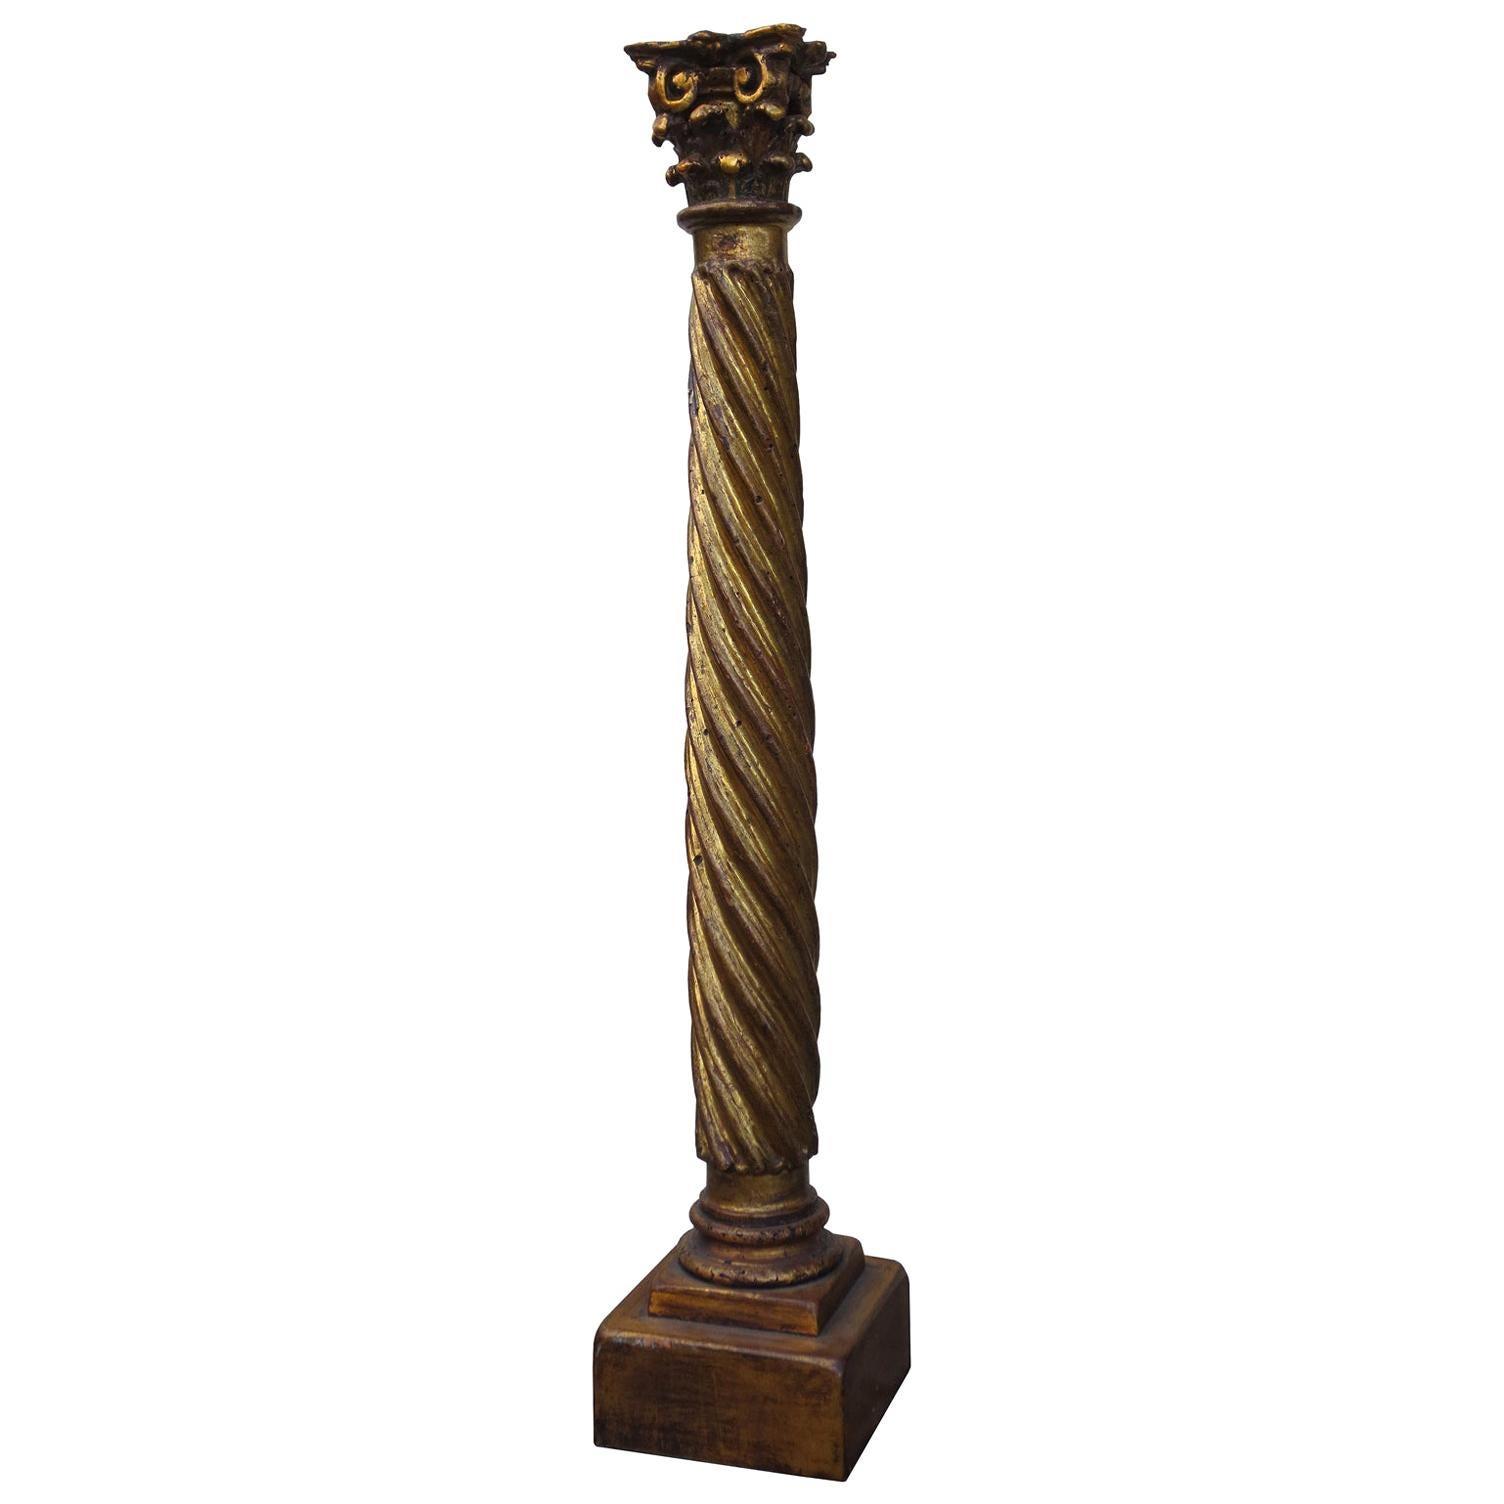 18th-19th Century Italian Giltwood Corinthian Column